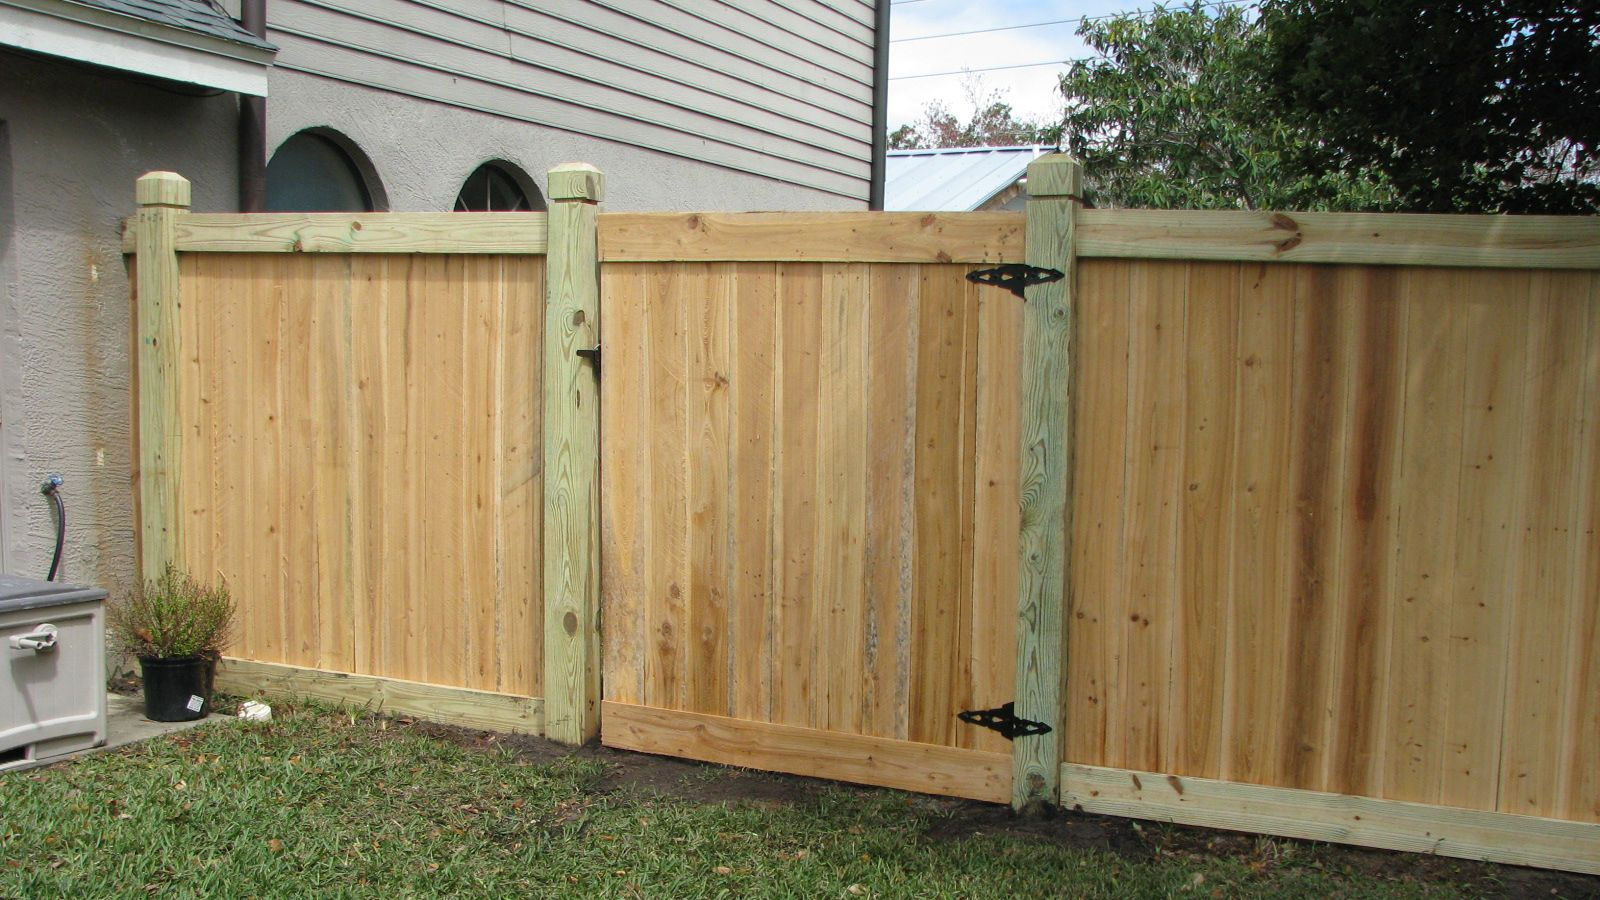 Wood Fences Wood Privacy Fence Wood Fence Fence Design